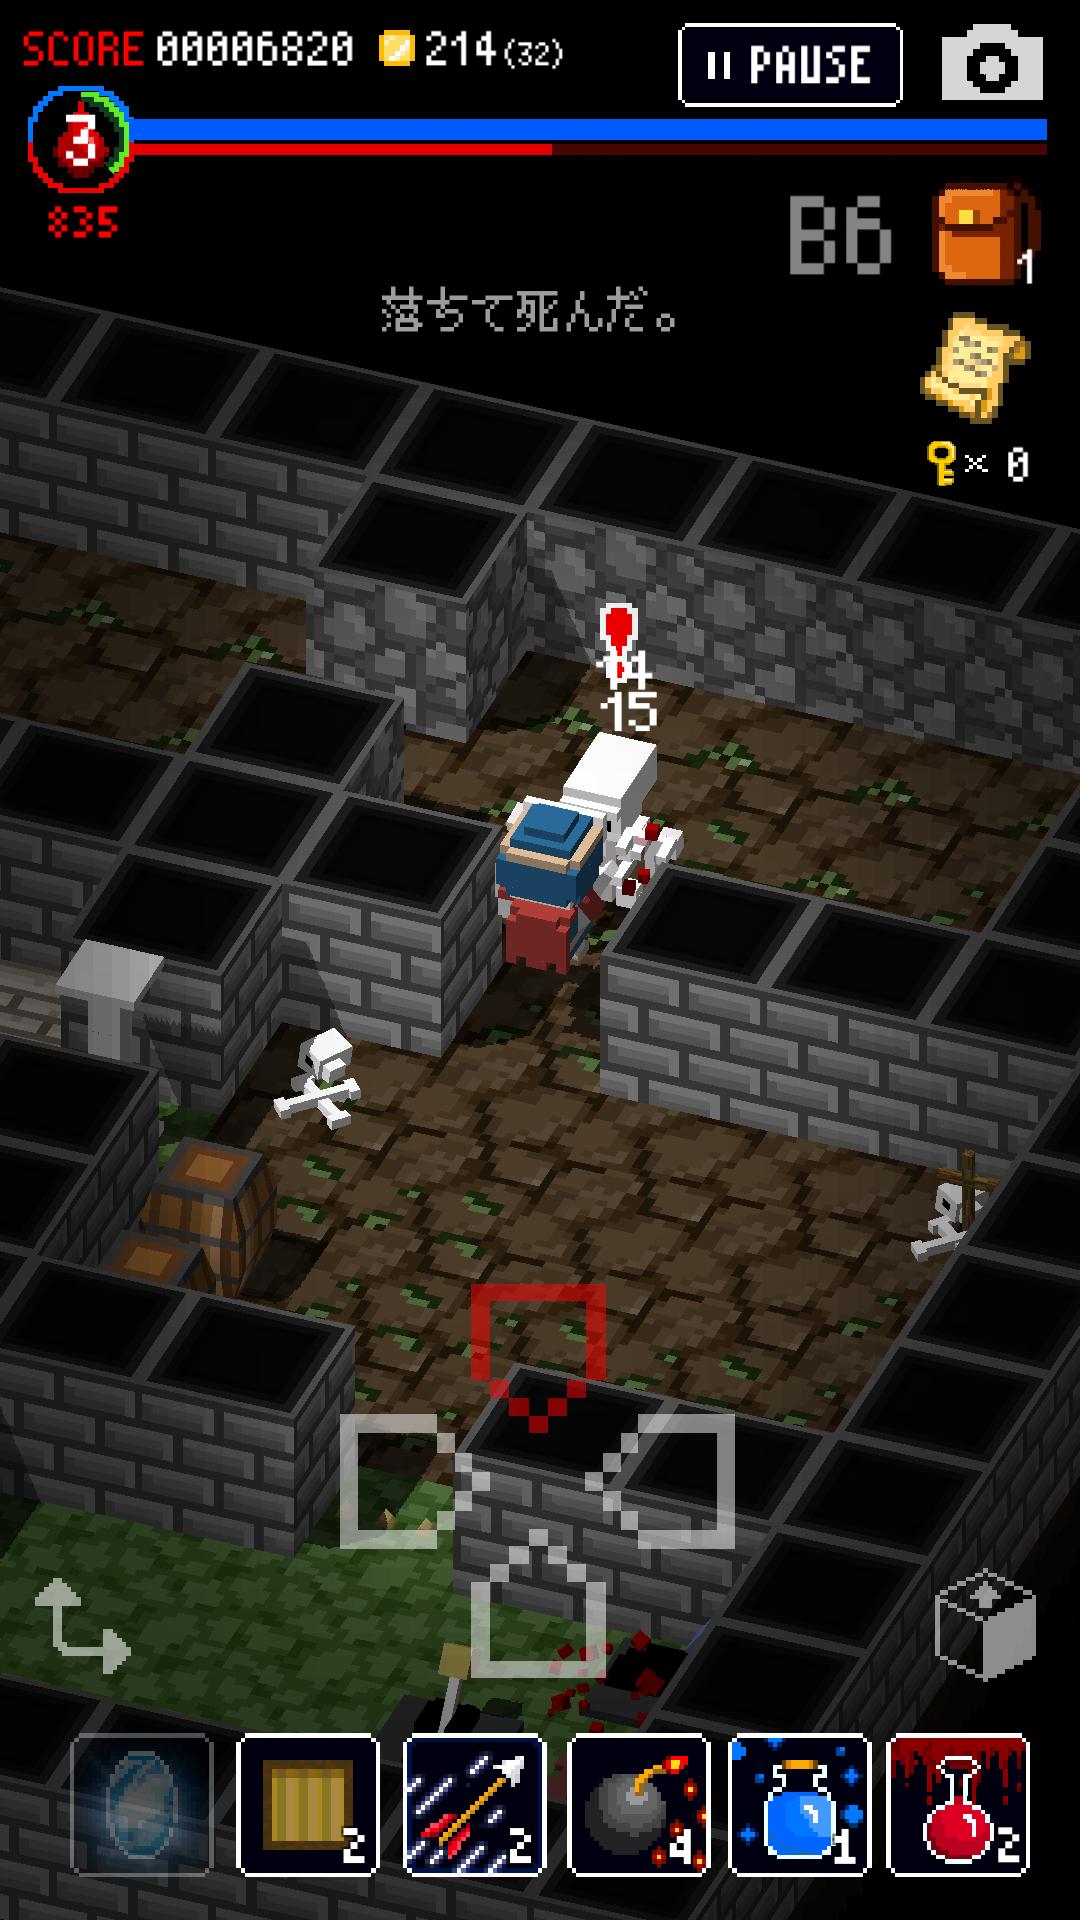 androidアプリ ダンジョンに立つ墓標(Dungeon of Gravestone)攻略スクリーンショット3